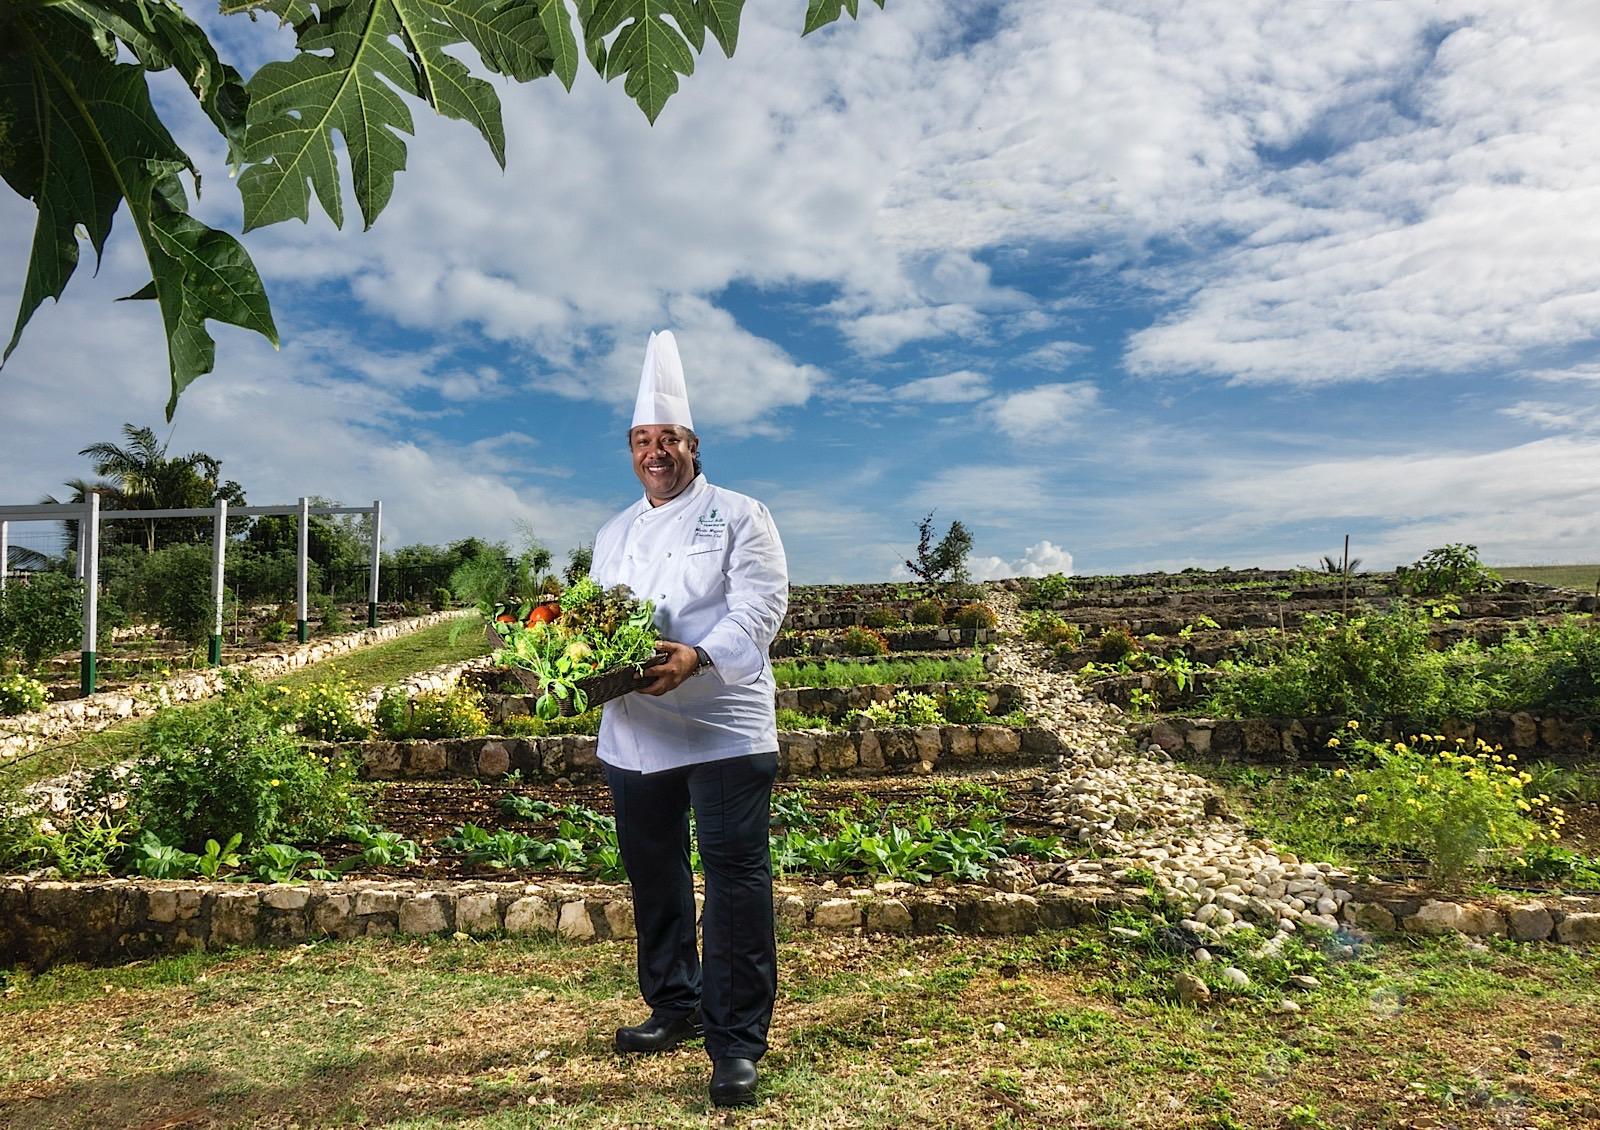 Photo_3_Chef_In_Organic_Garden.jpg